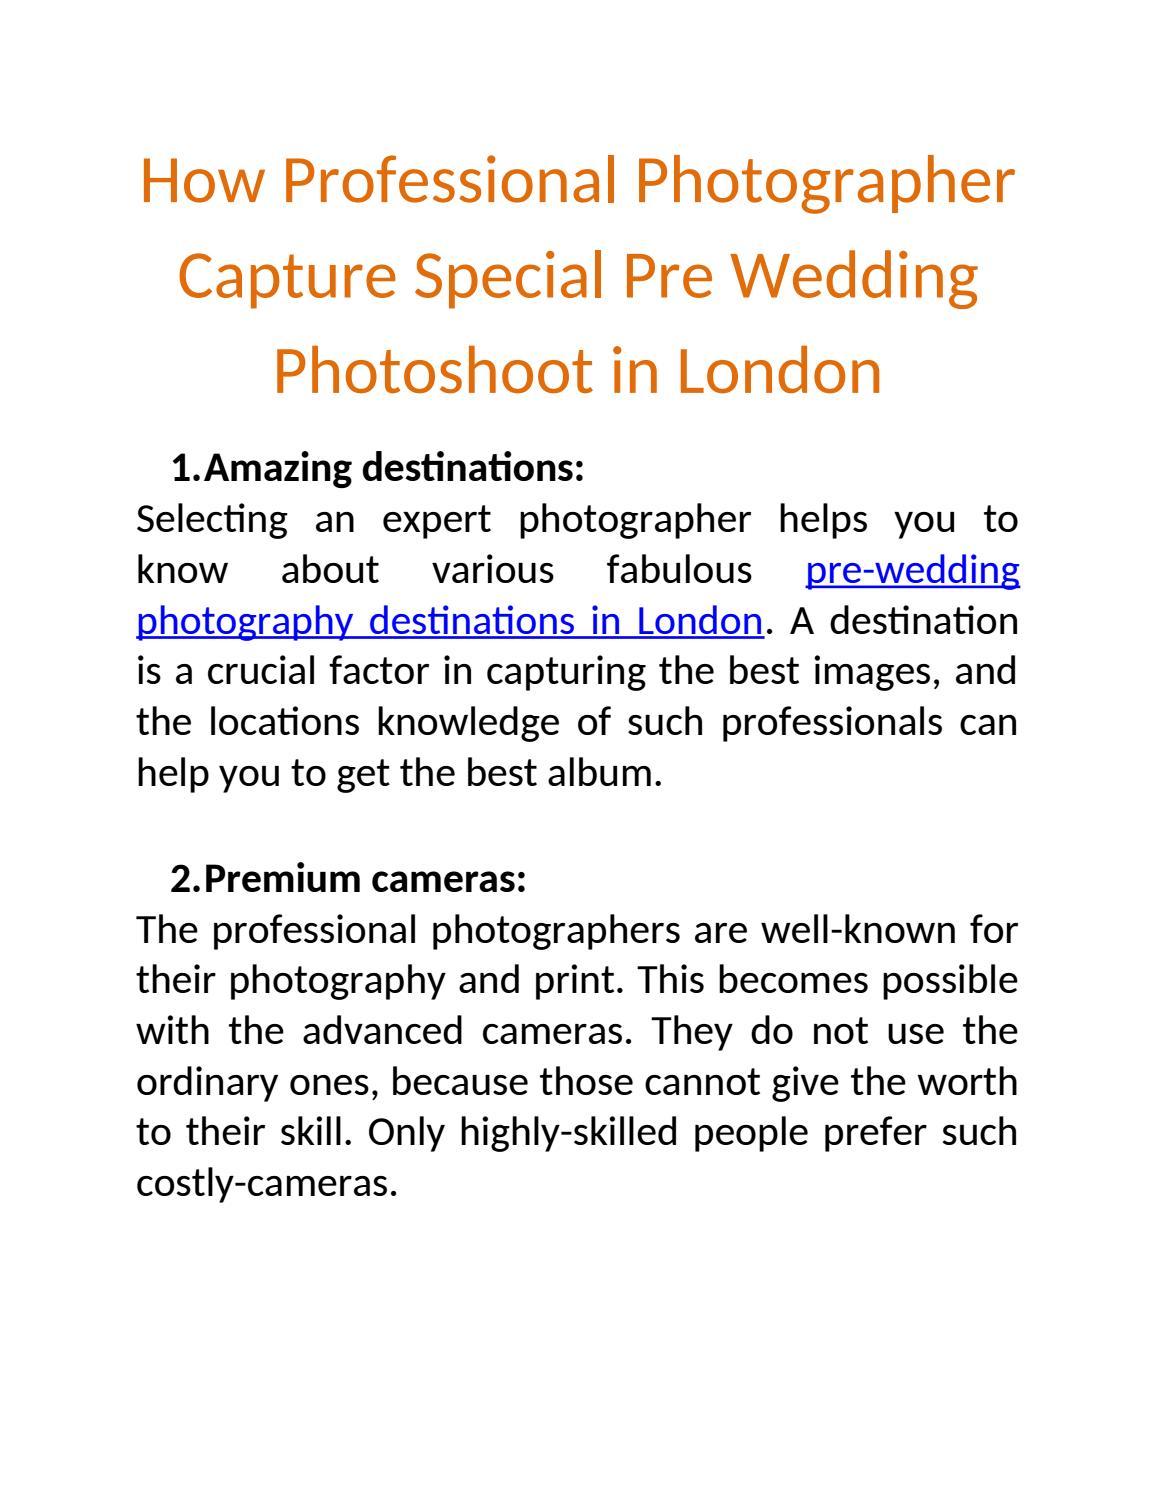 How Professional Photographer Capture Special Pre Wedding